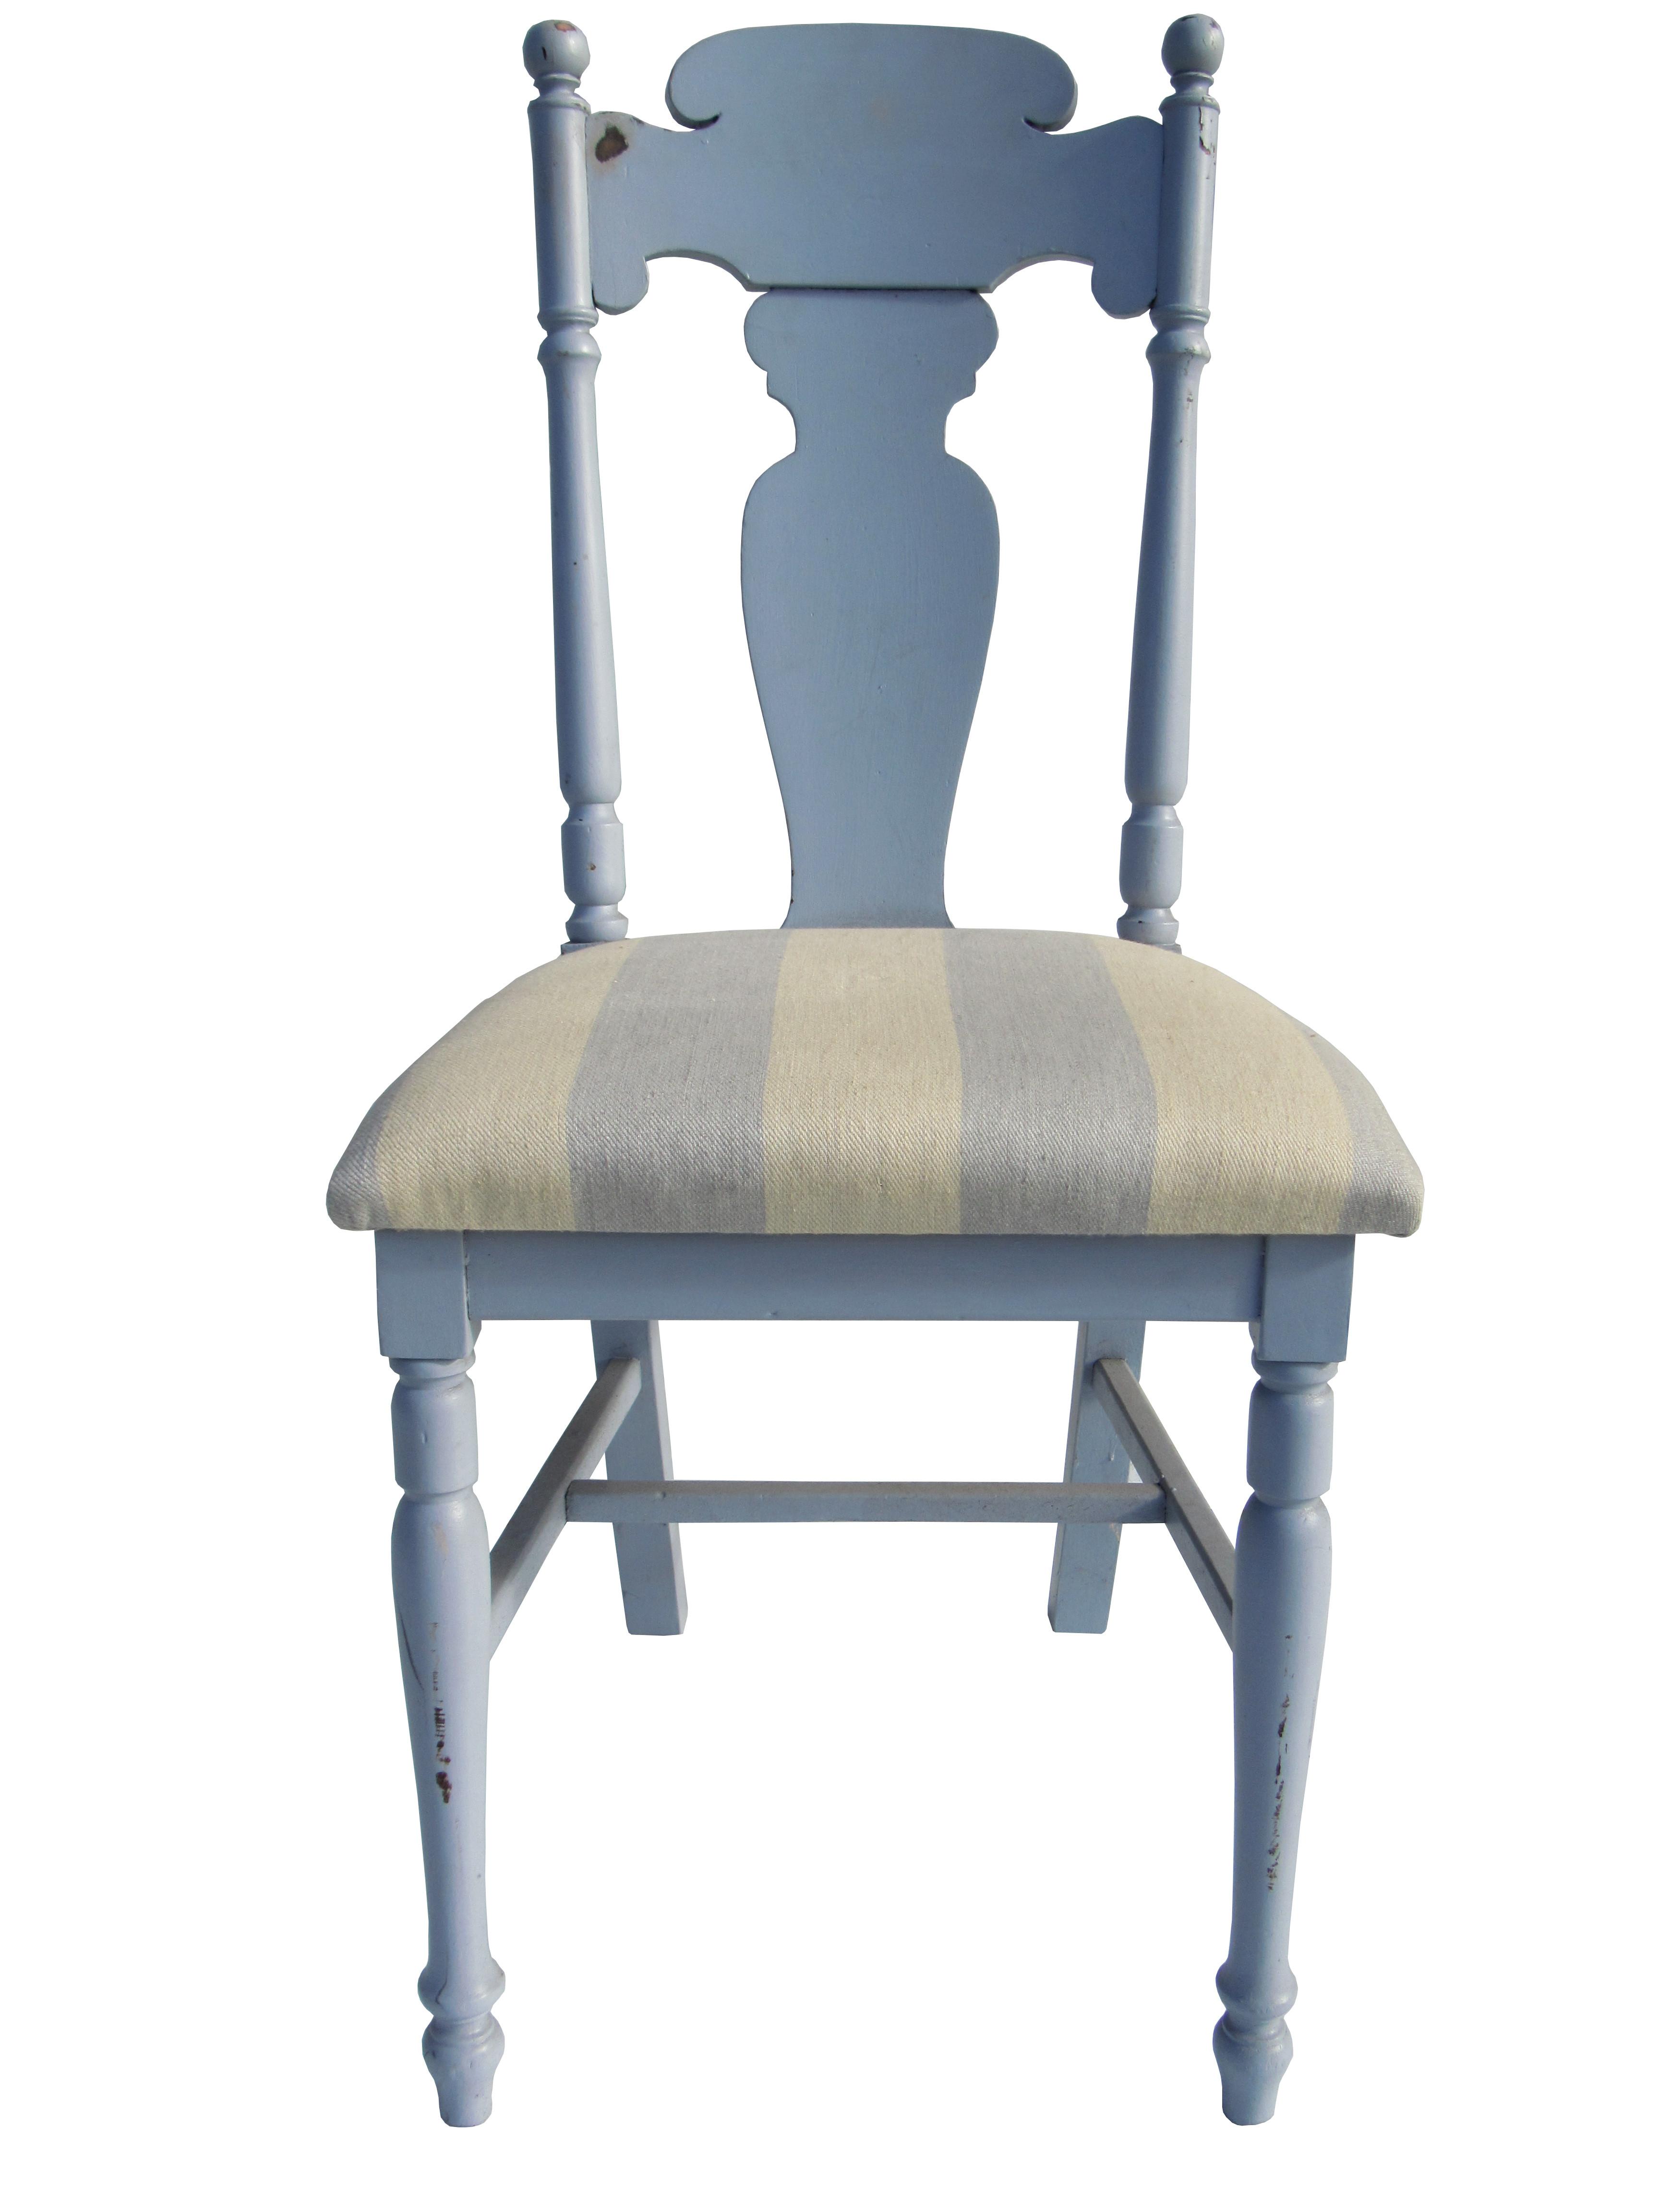 Rustic Farmhouse Desk And Chair